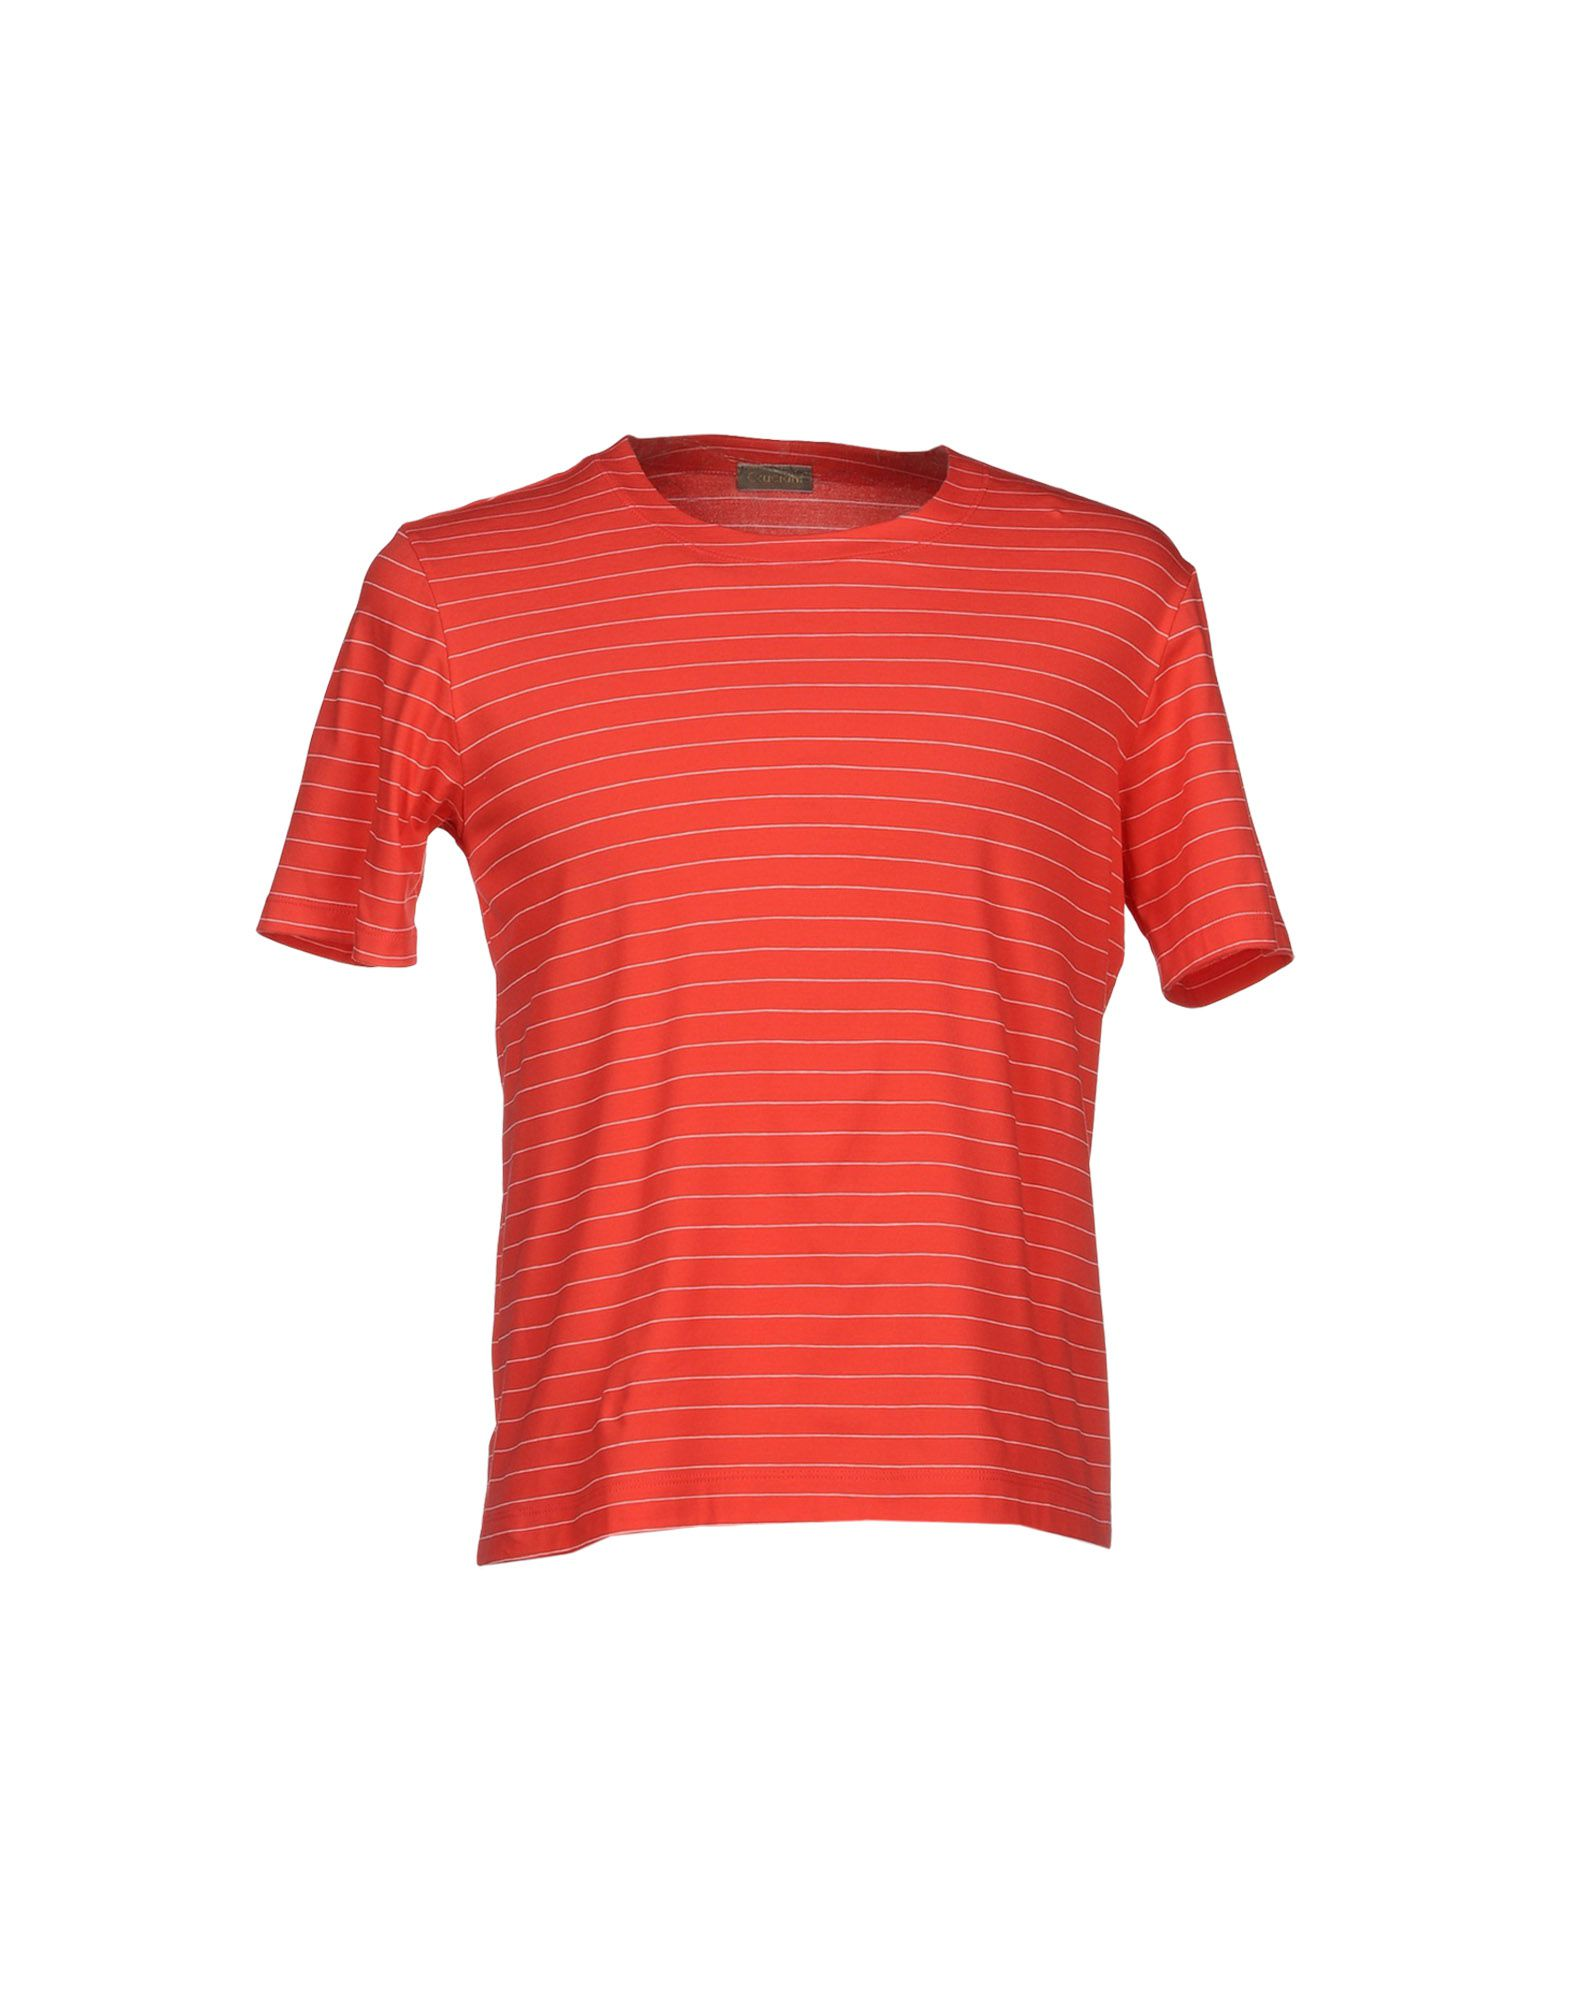 best sneakers c97a3 ed24f Cruciani T-Shirt - Cruciani Uomo - YOOX